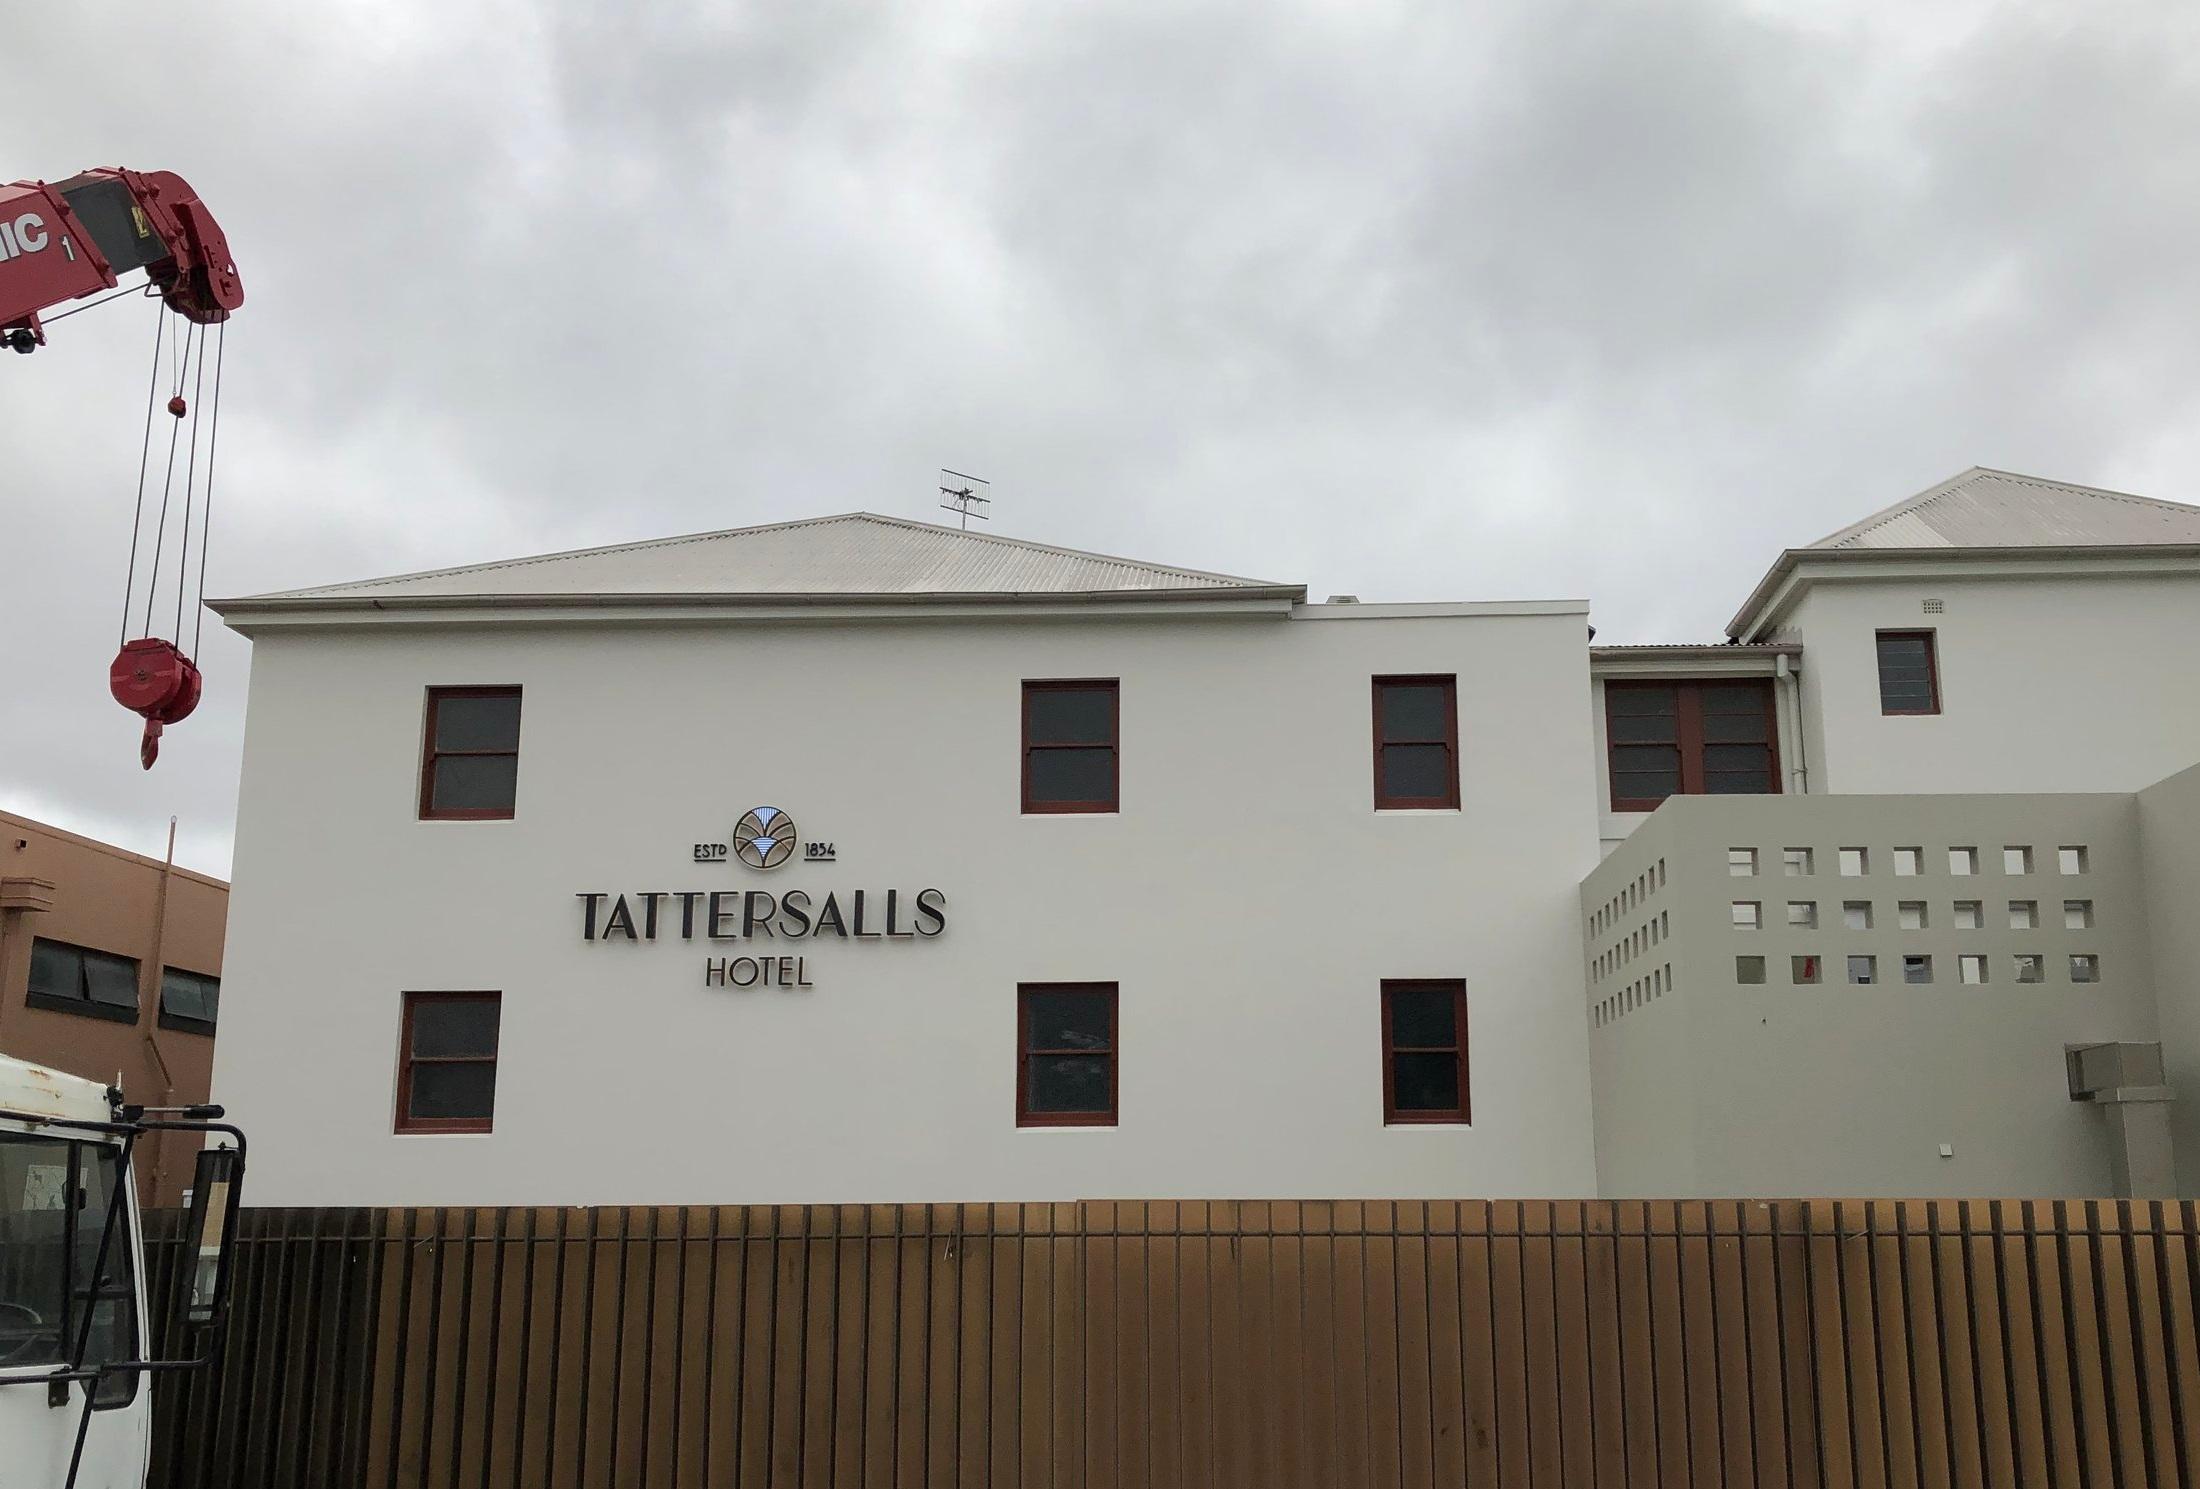 Tattersalls Hotel 25-2-2019